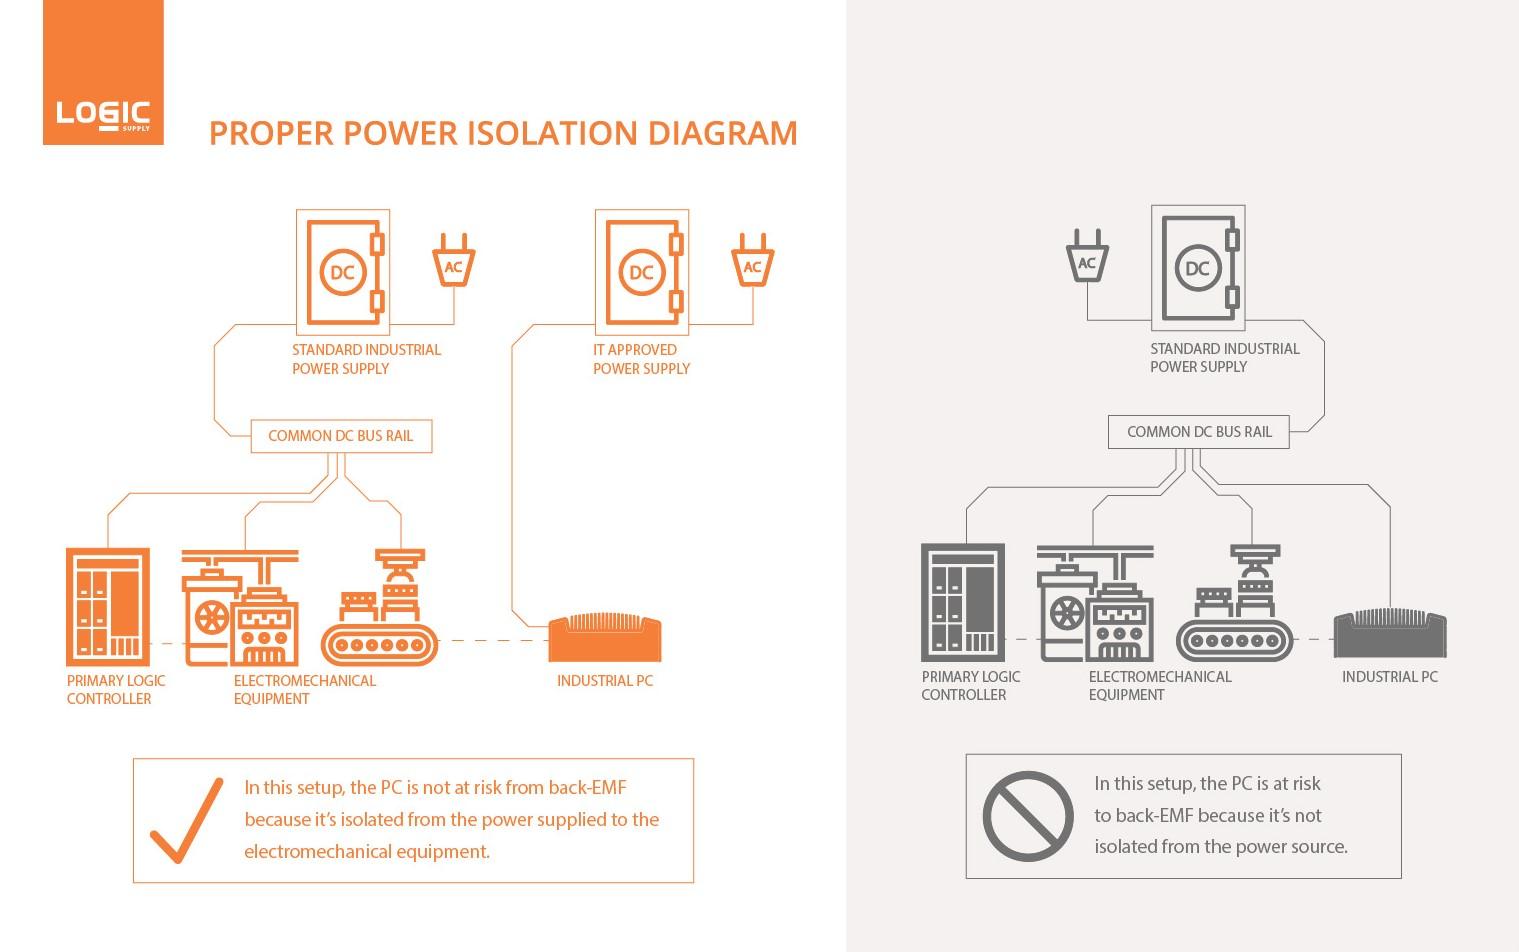 Proper Power Isolation Diagram